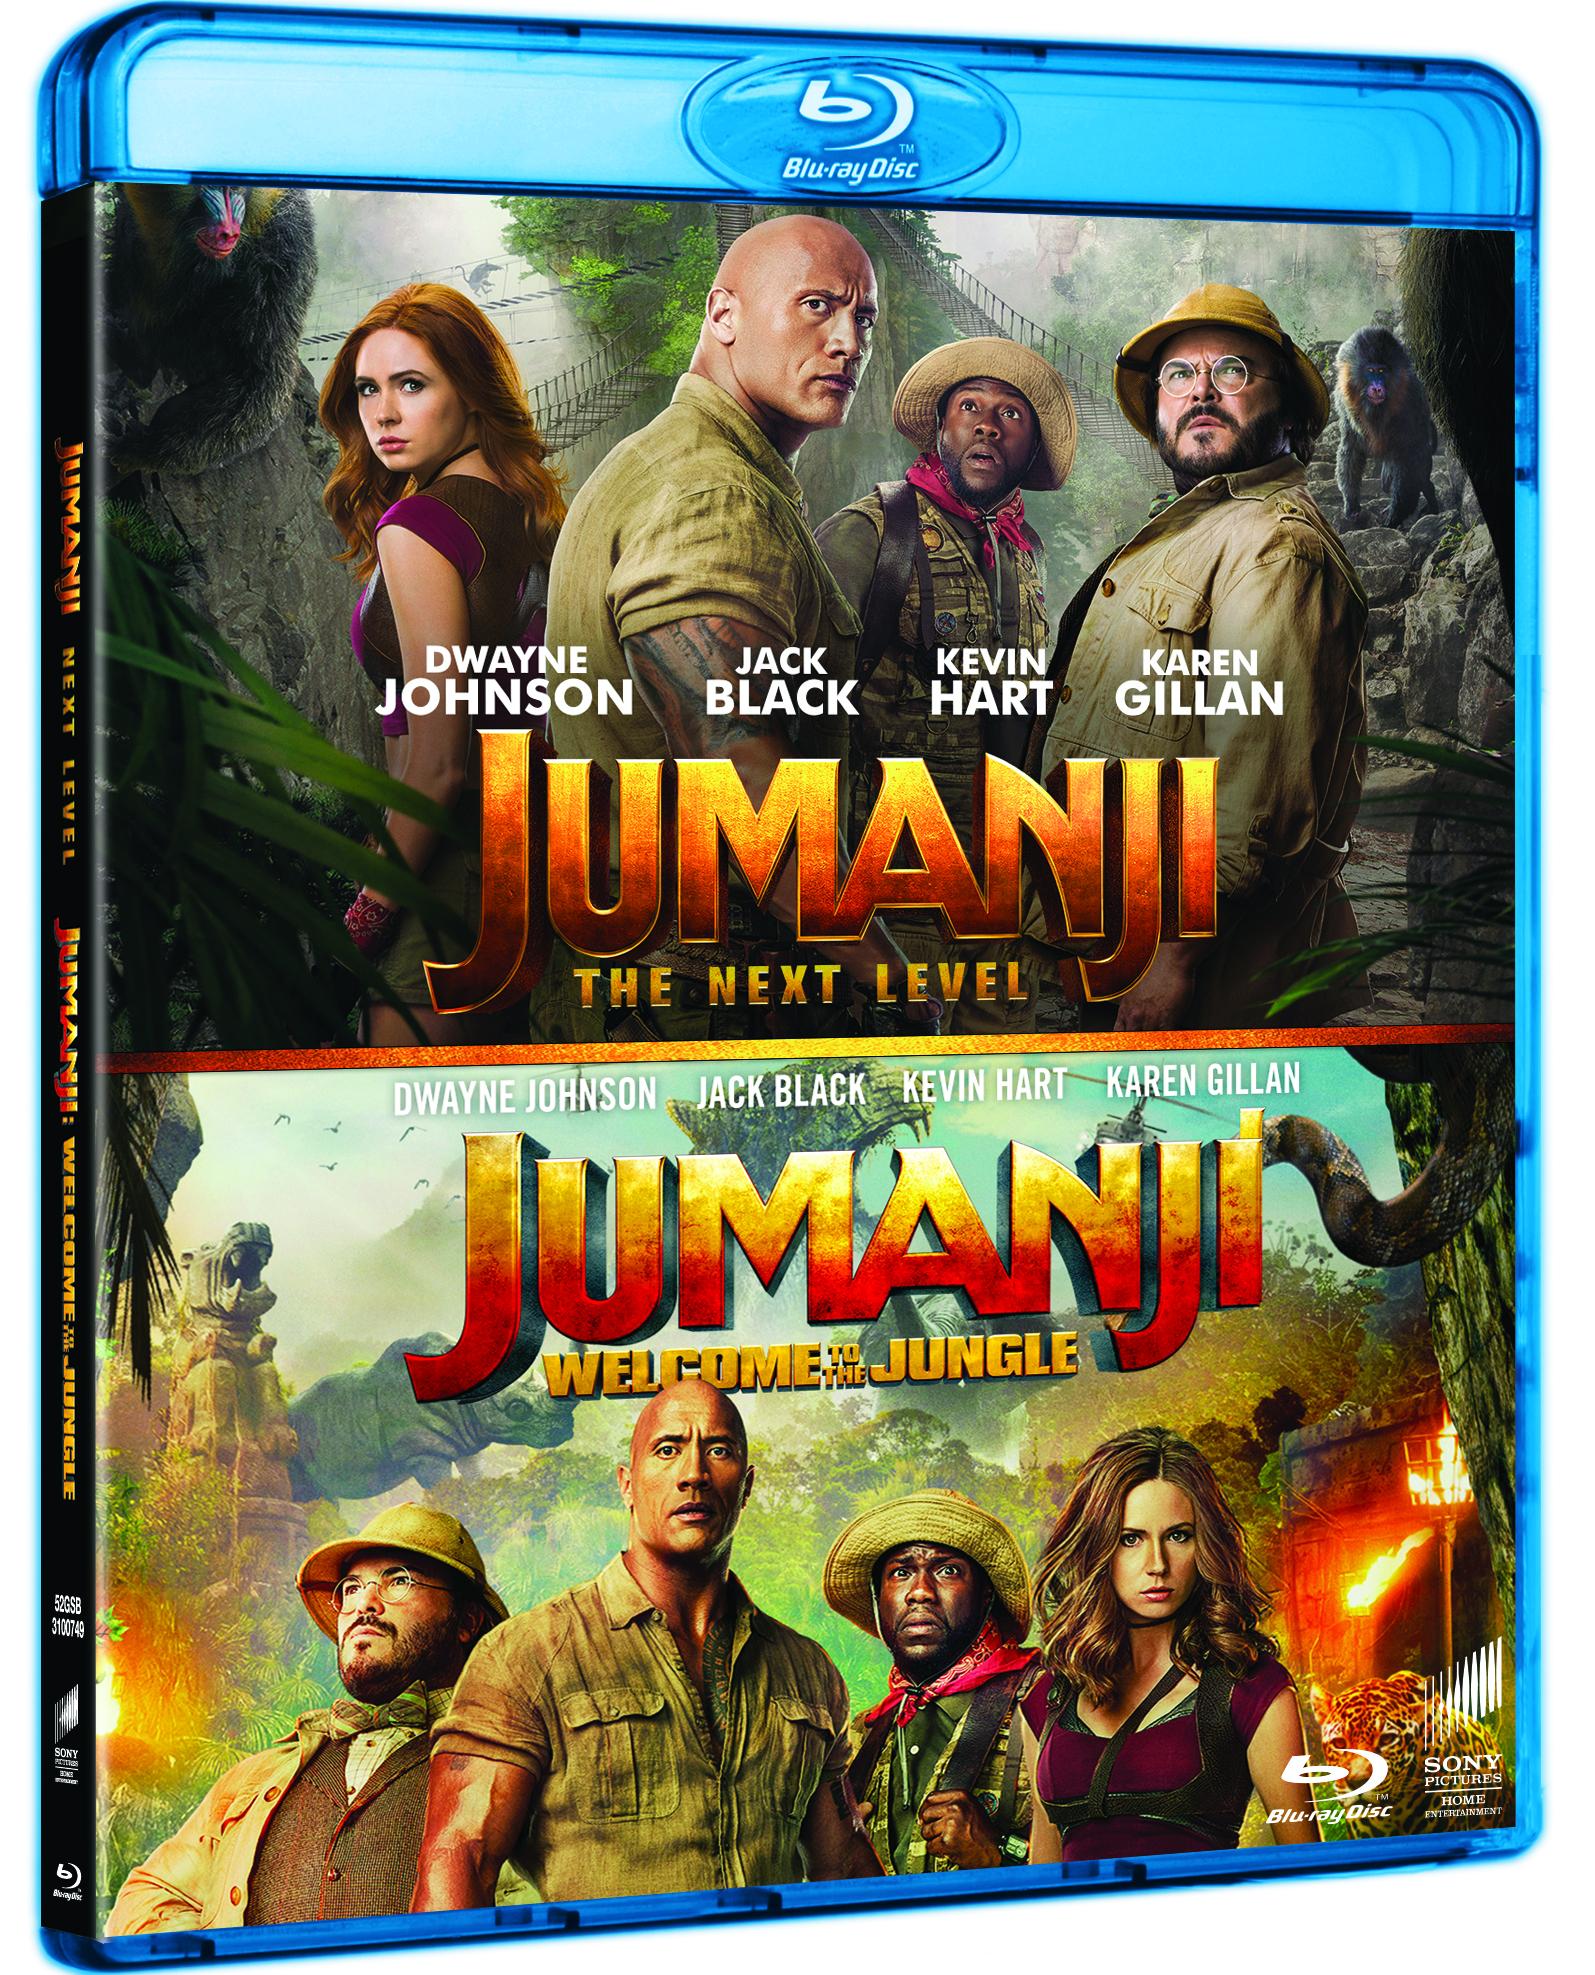 Jumanji 1-2 (2020) - Blu Ray